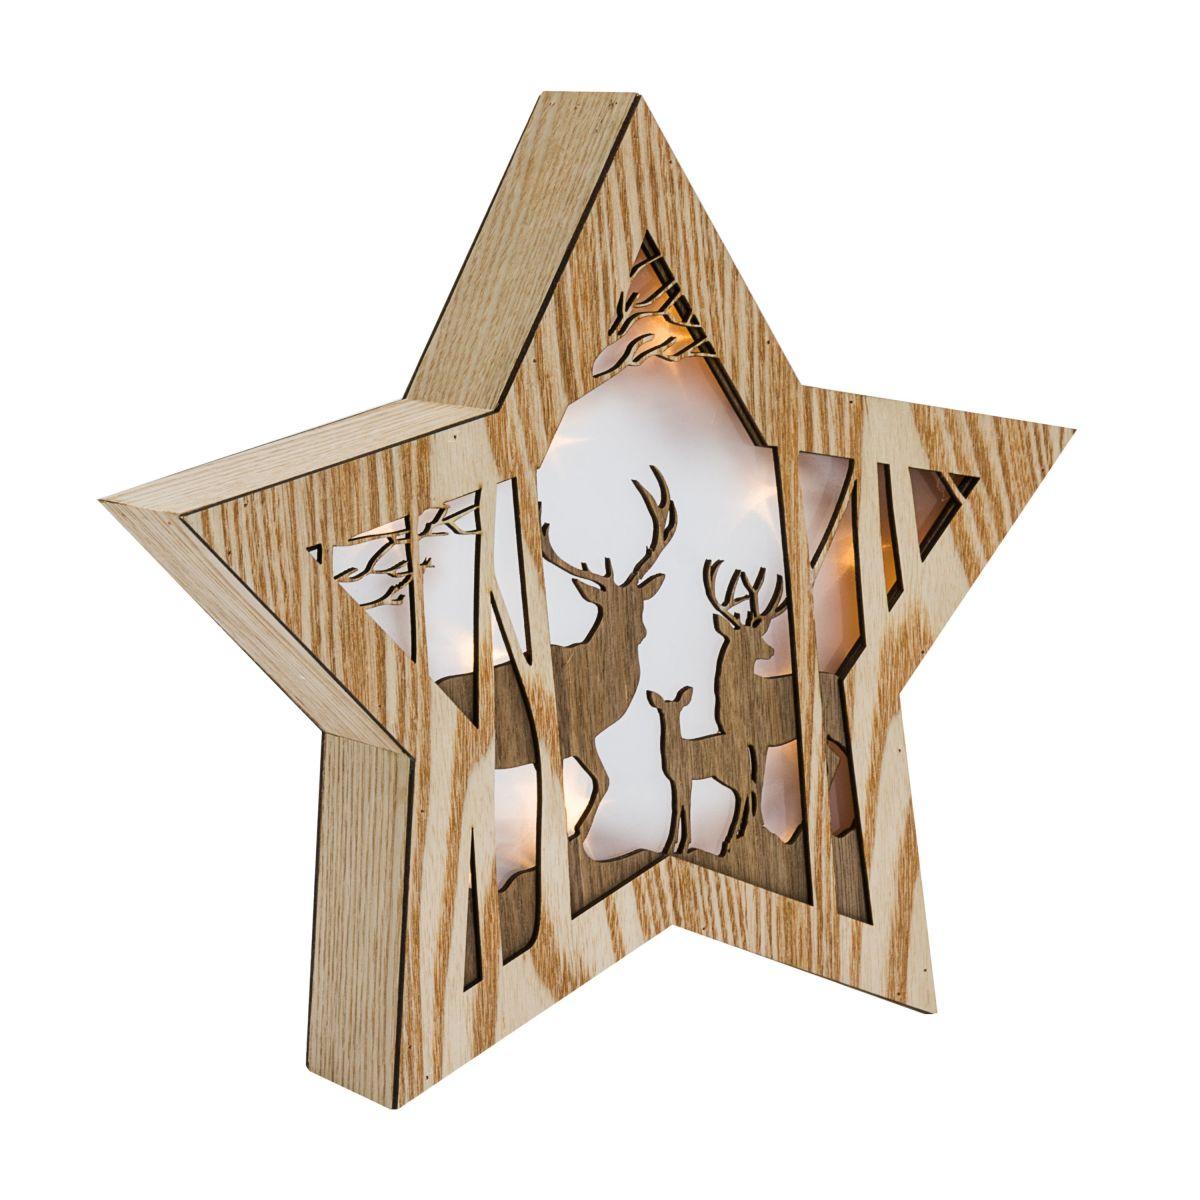 Led deko objekt 3d stern wintertiere beleuchtet ca h27 for Stern beleuchtet weihnachten